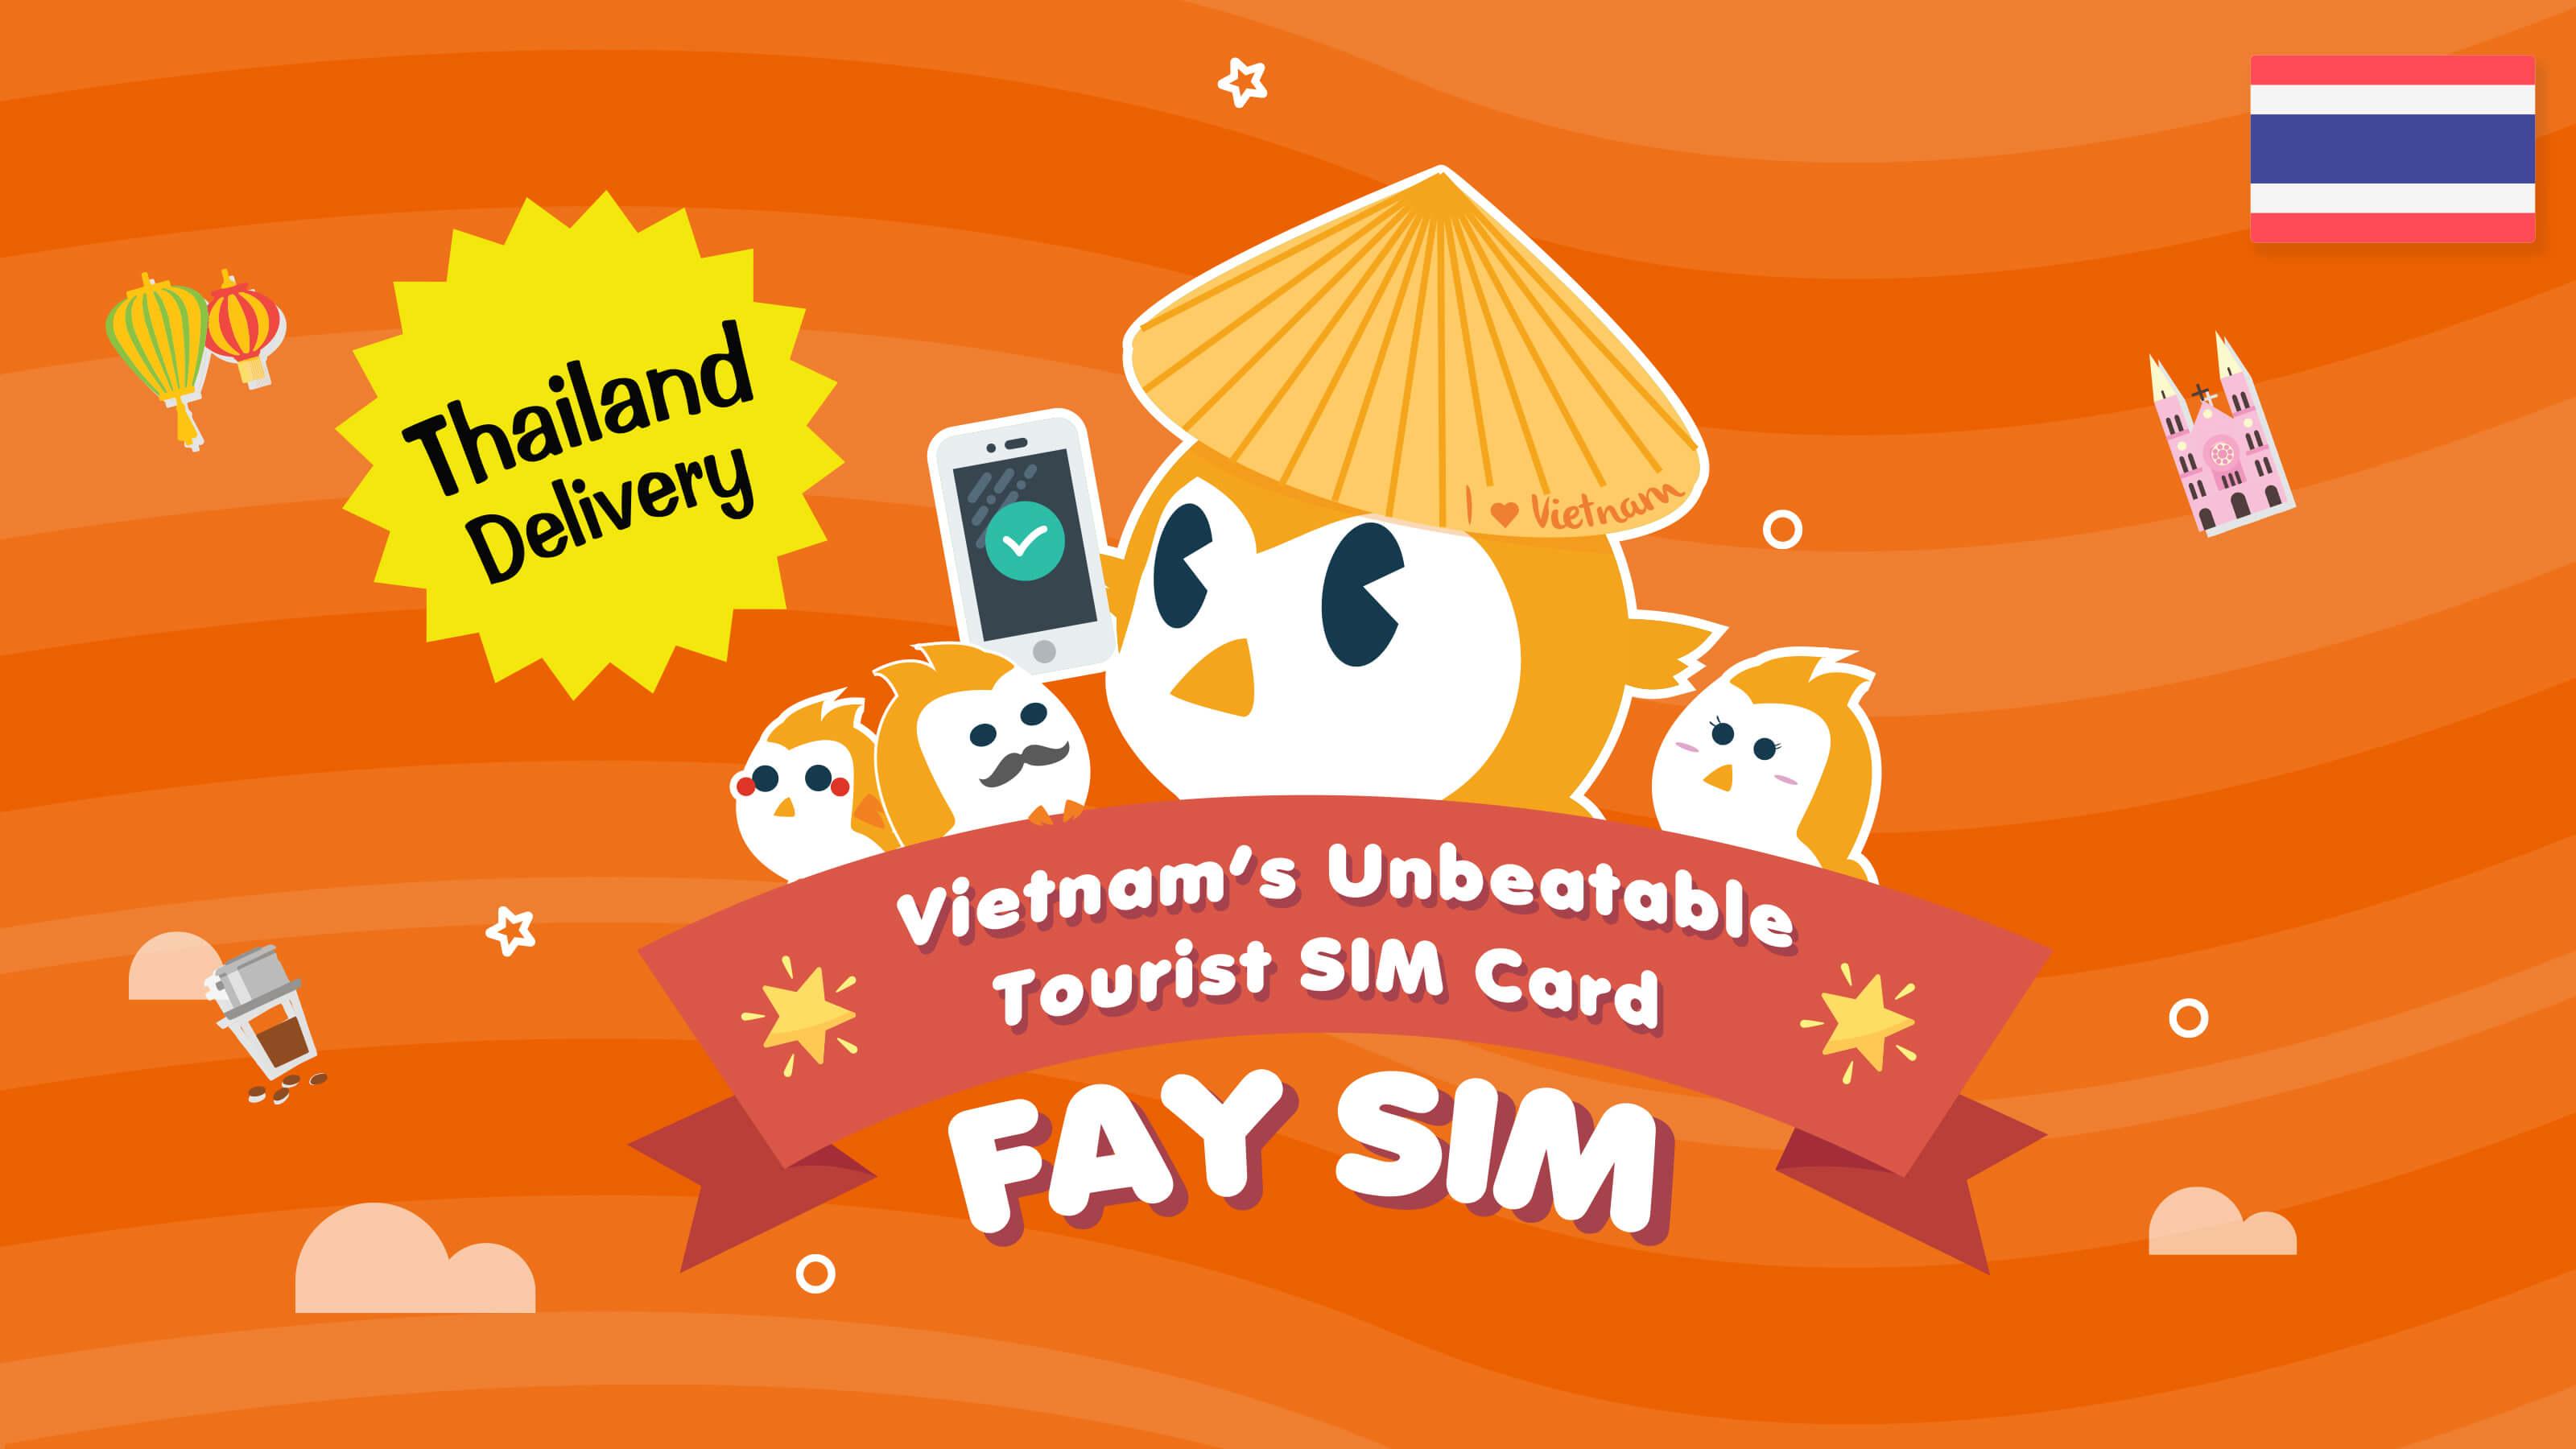 FAY SIM (Thailand Delivery)